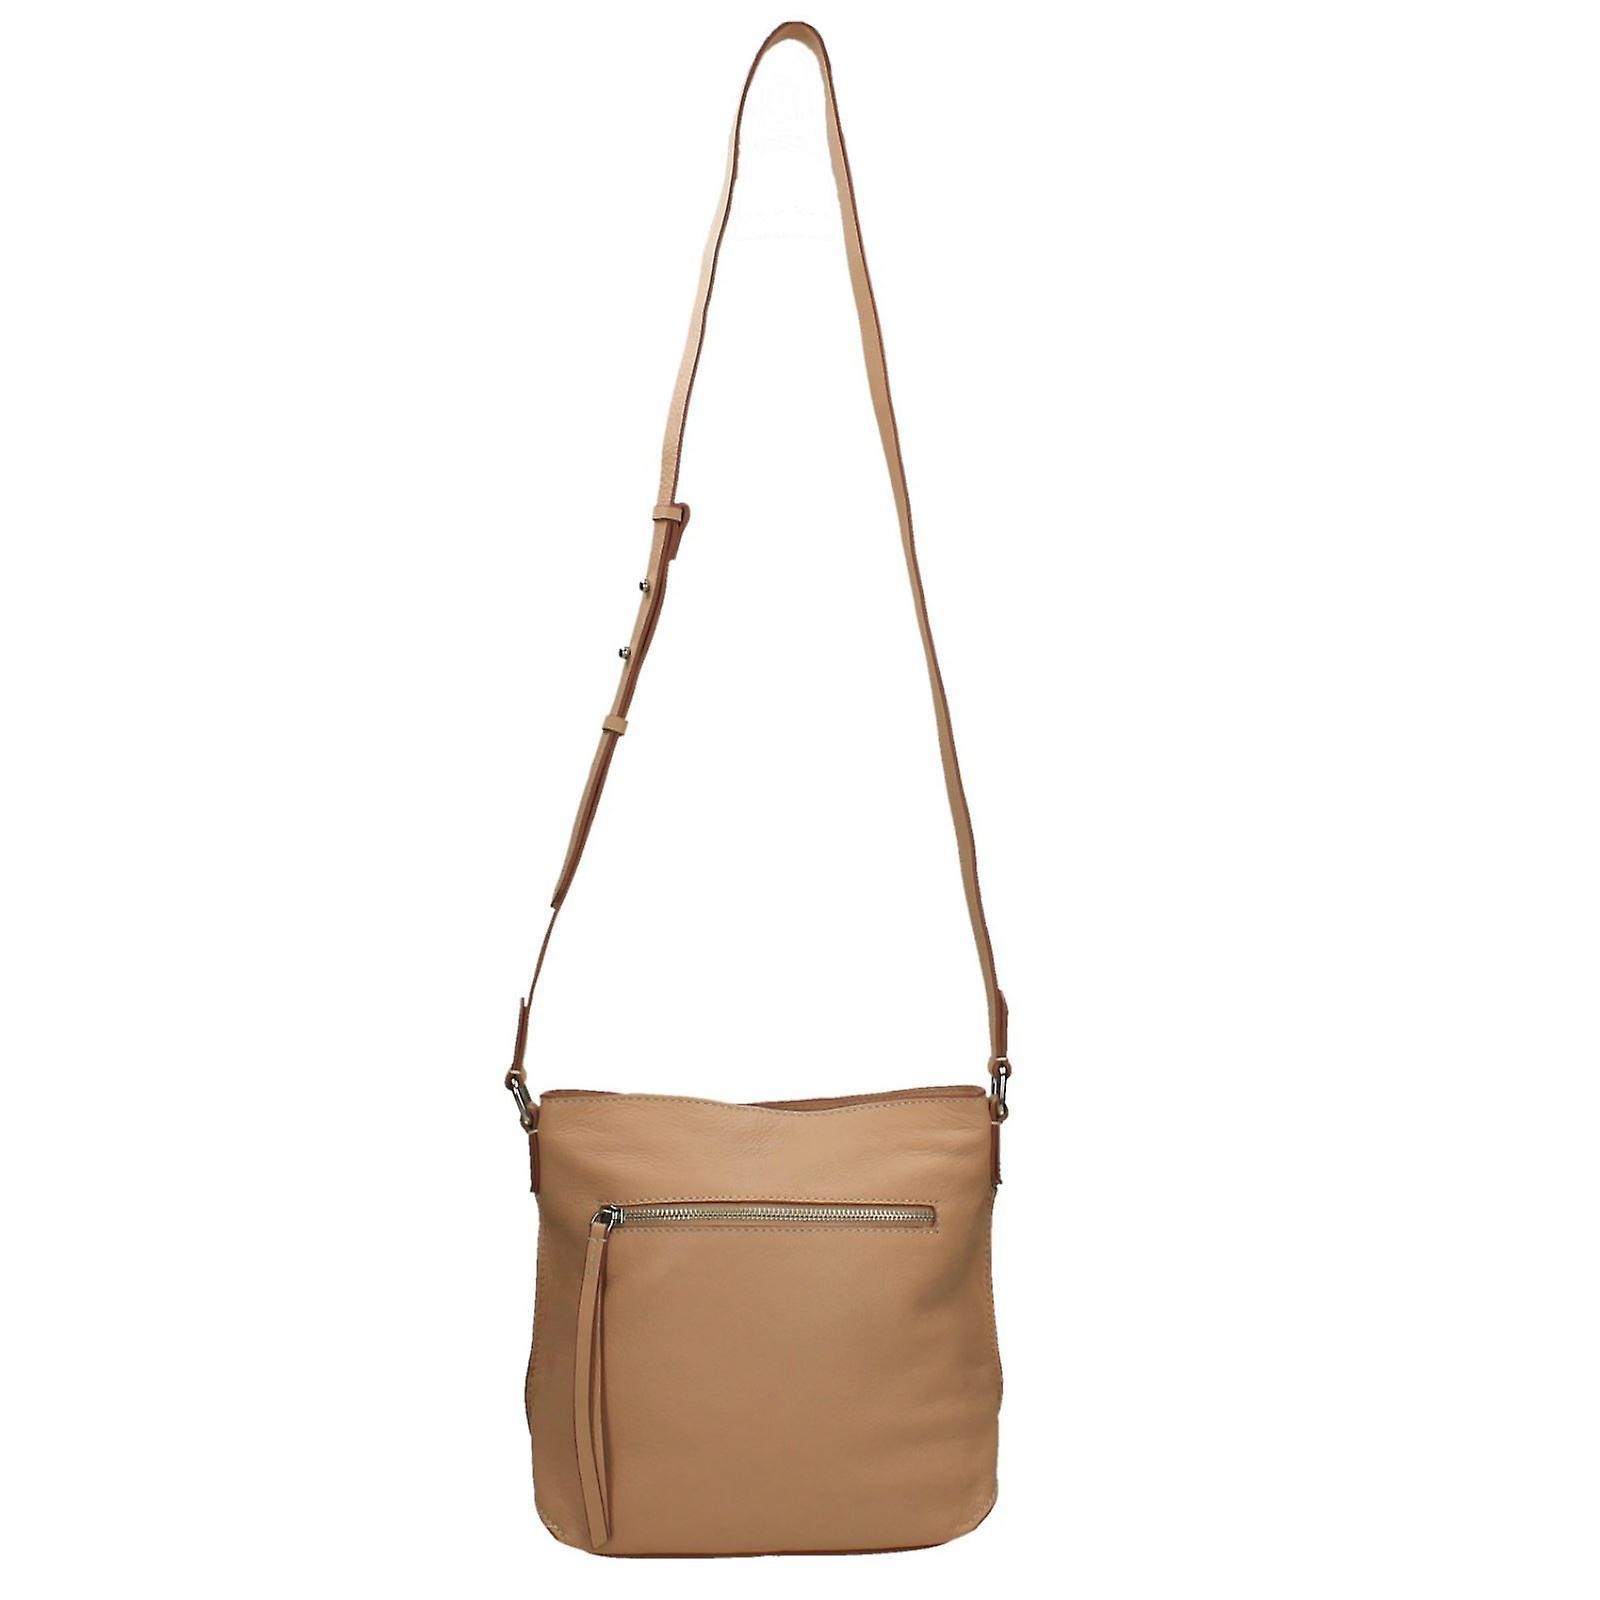 Ladies Clarks Casual Crossbody Bag Topsham Jewel  beca0728eea88